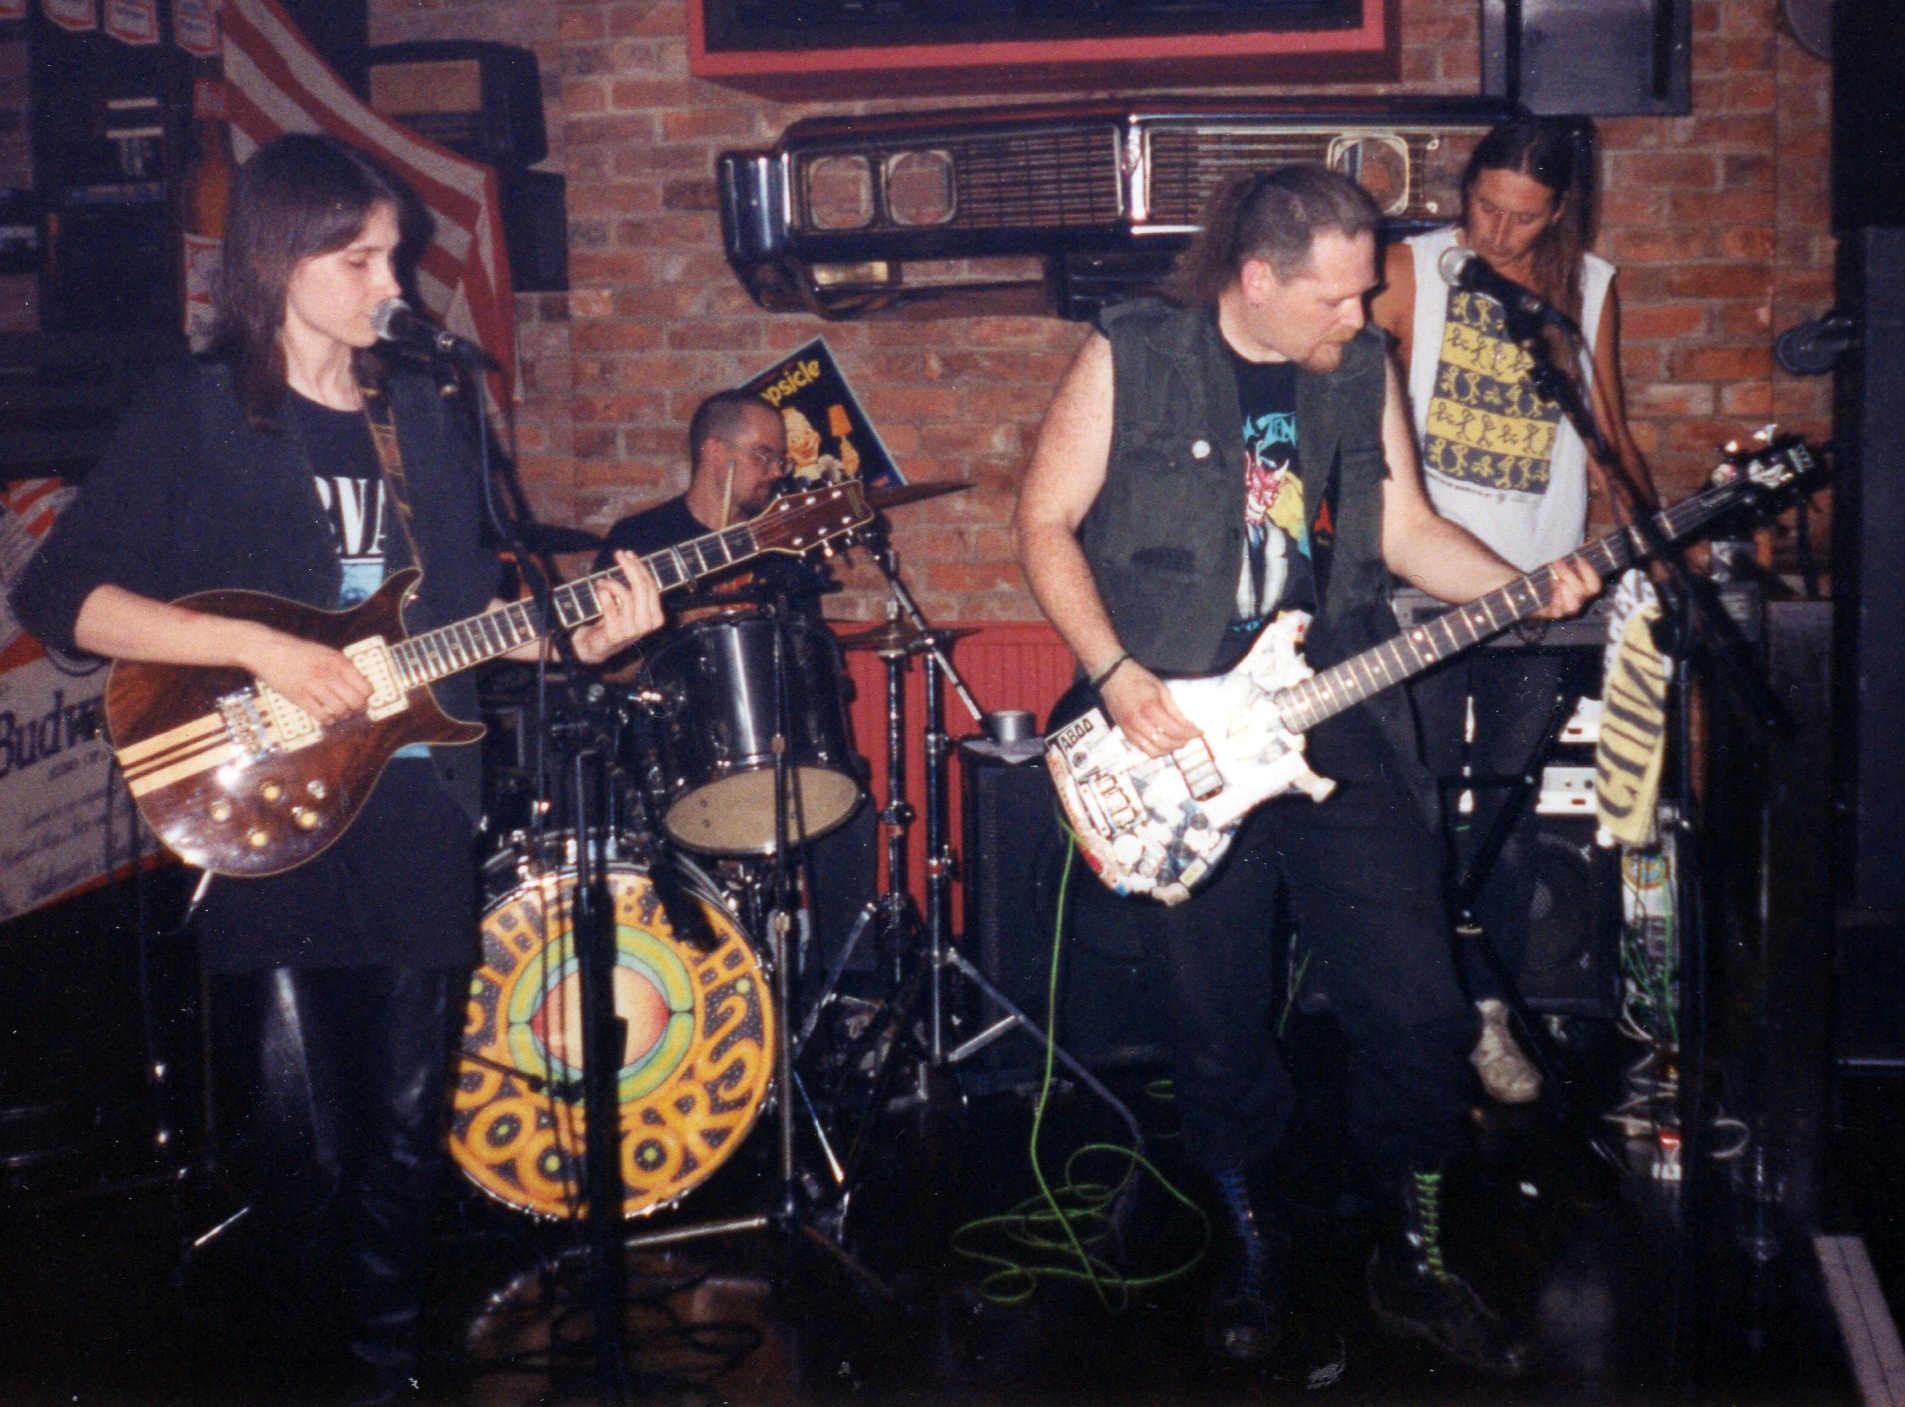 wendy old band.jpg